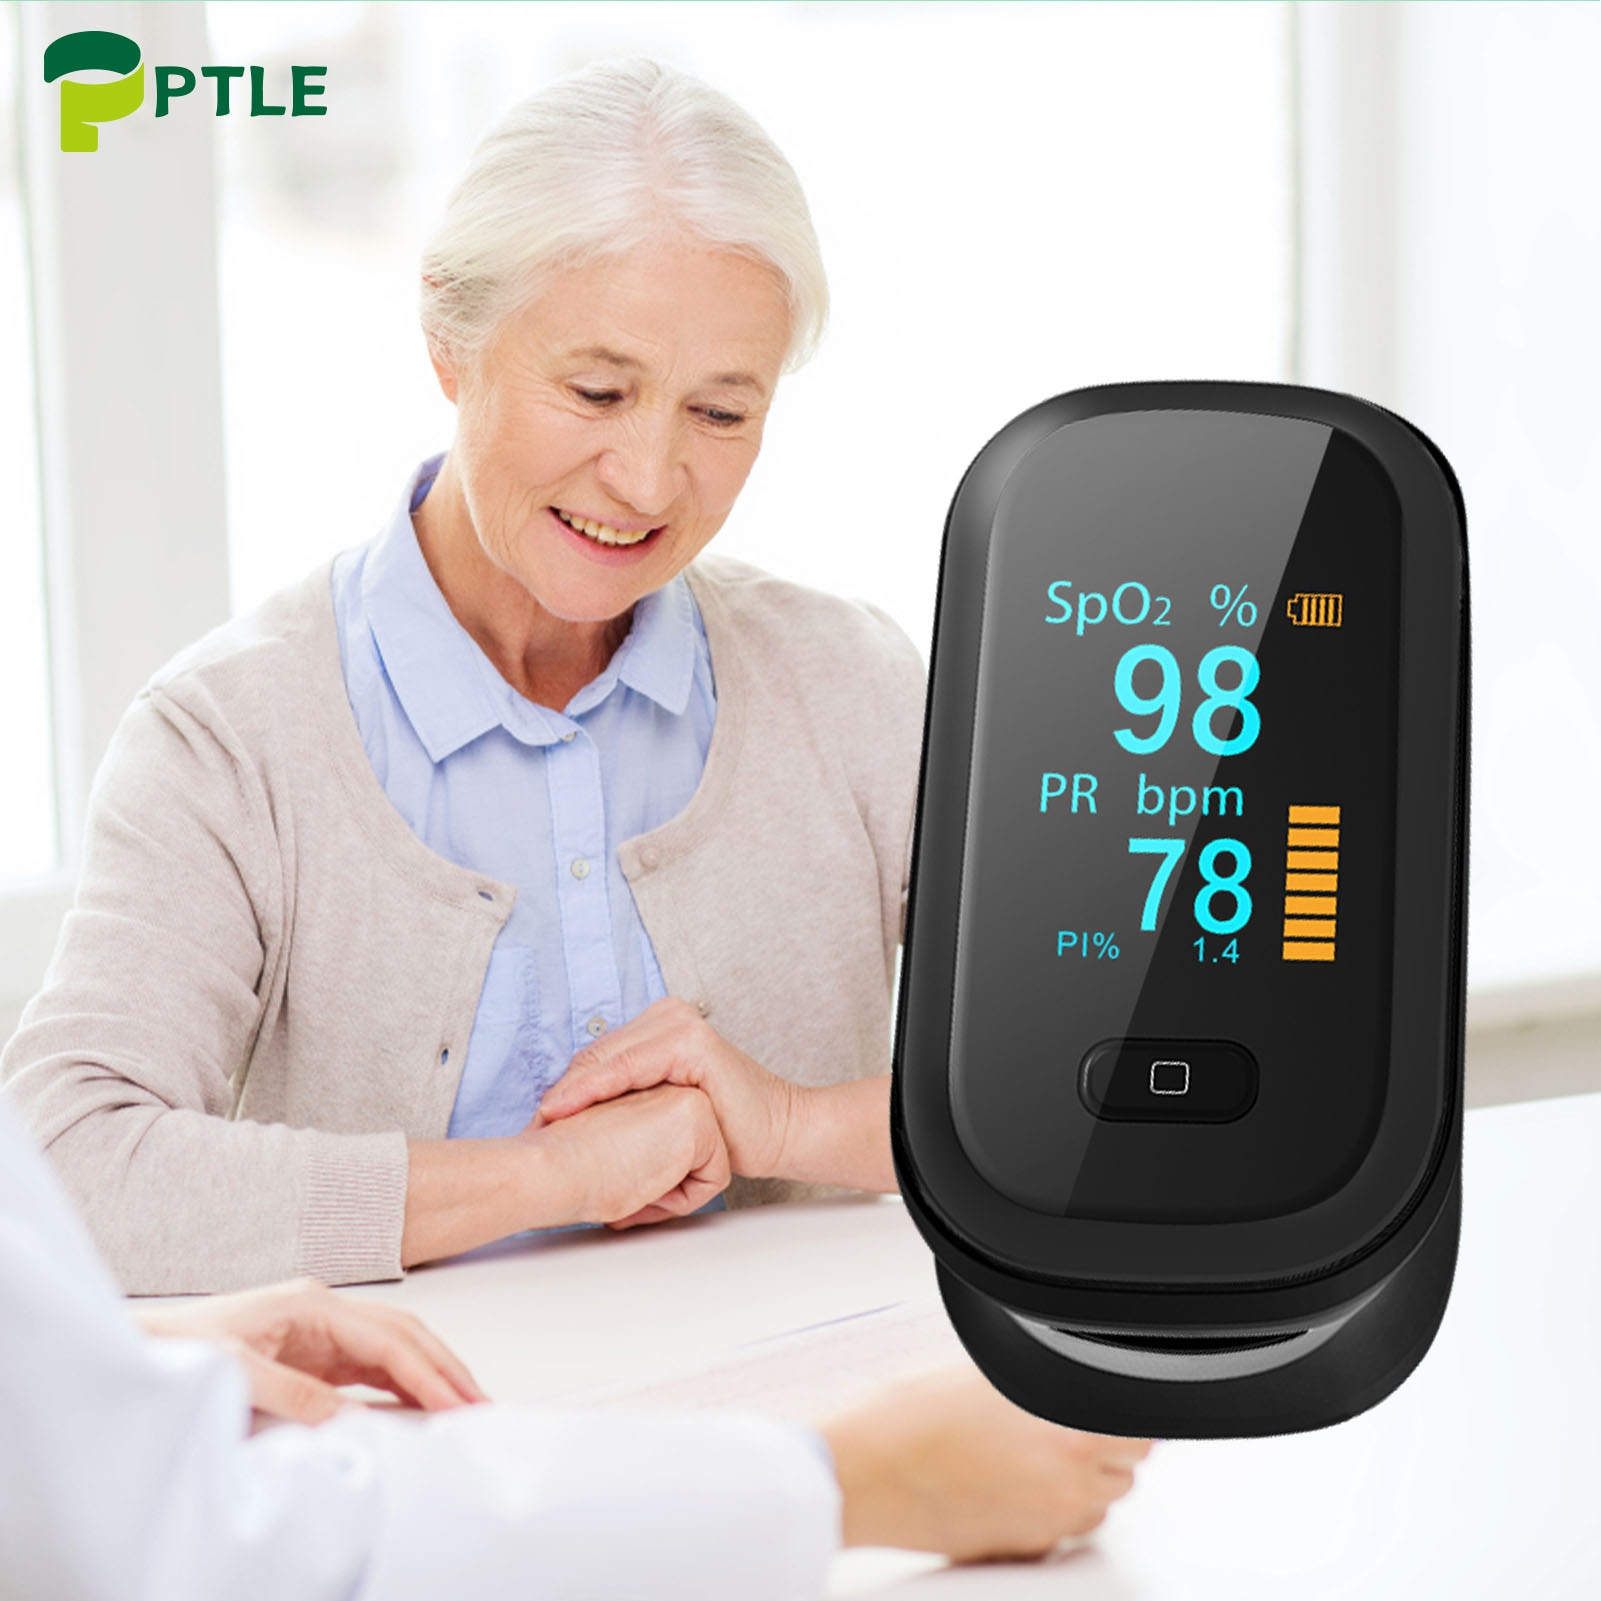 OLED Spo2 Fingertip Oximeter Portable Finger Pulse Oximeter Heart Blood Oxygen Rate Saturation Monitor Household Health Monitors